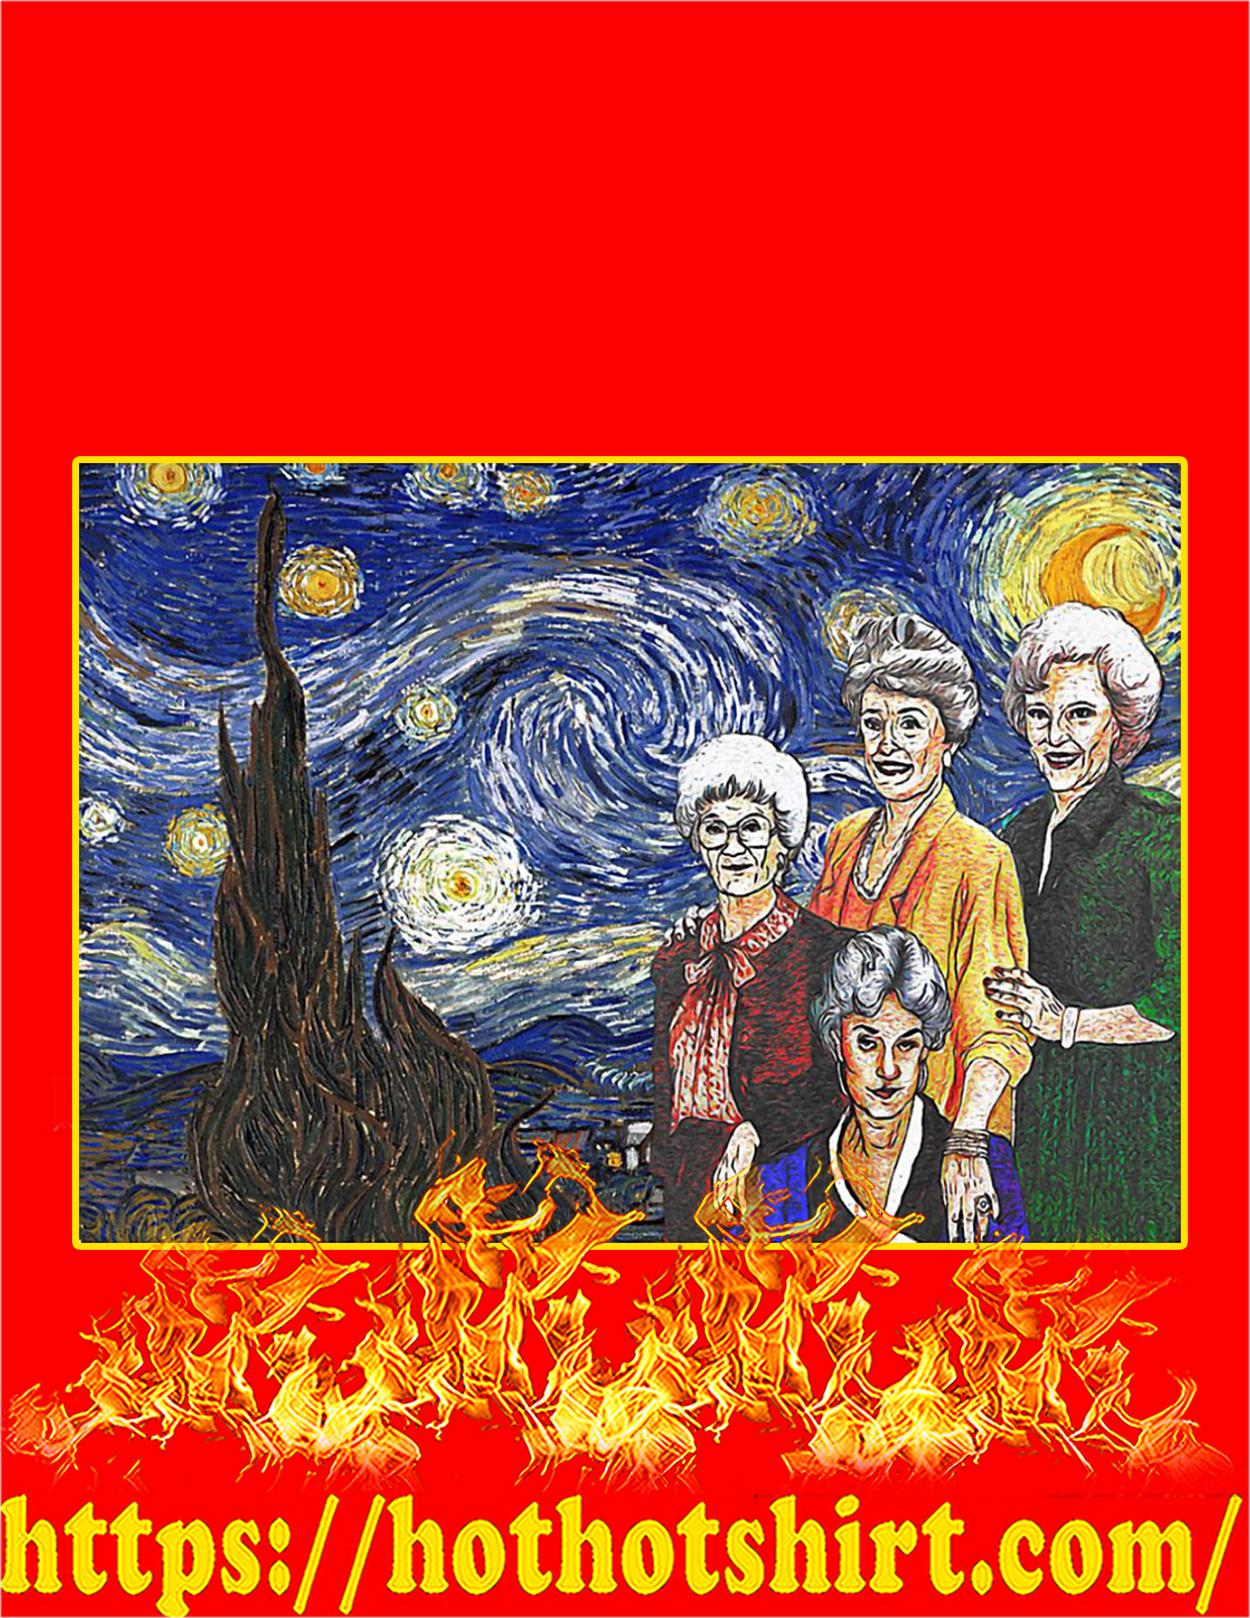 The golden girls starry night poster - A3